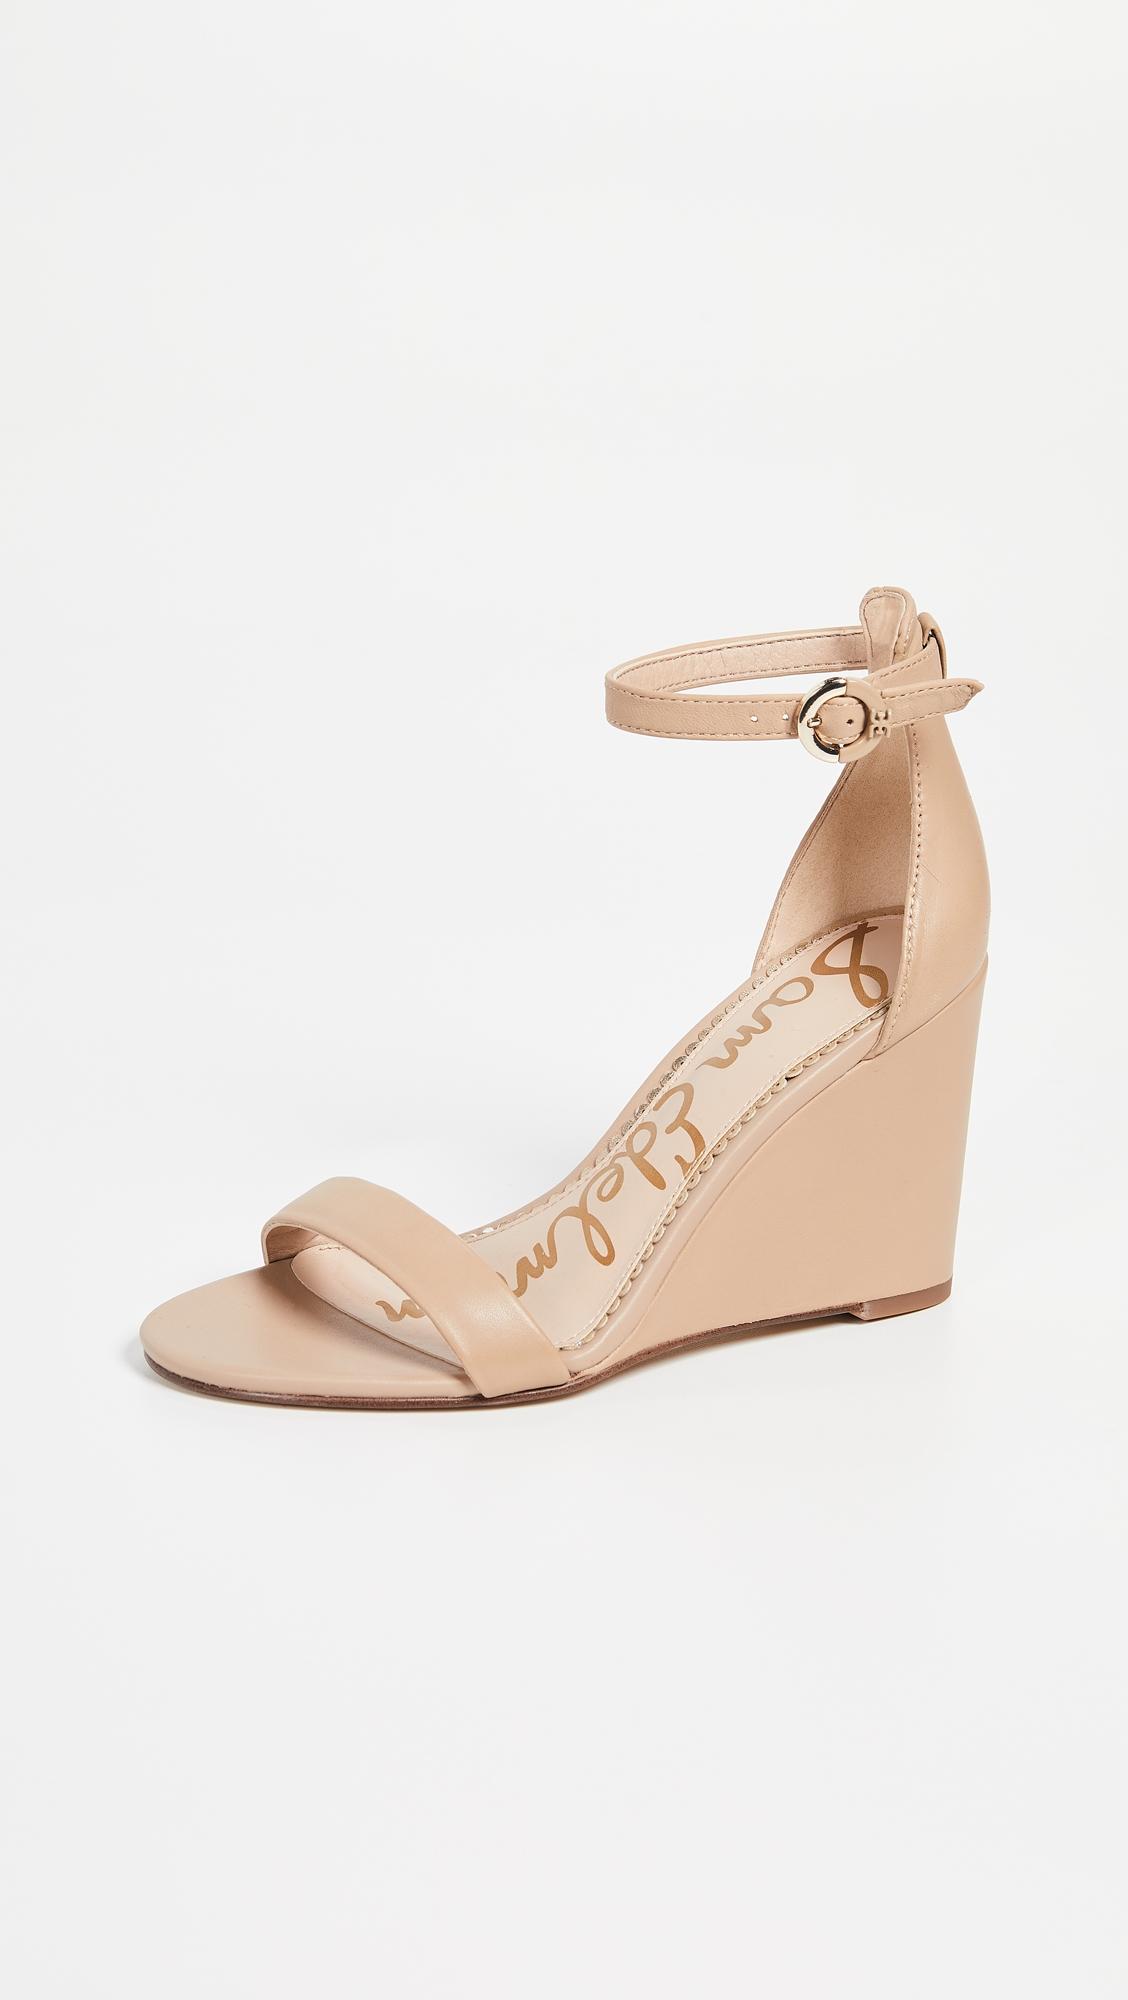 b34c3dfc77f Sam Edelman Neesa Sandals in 2019 | Products | Sandals, Women's ...